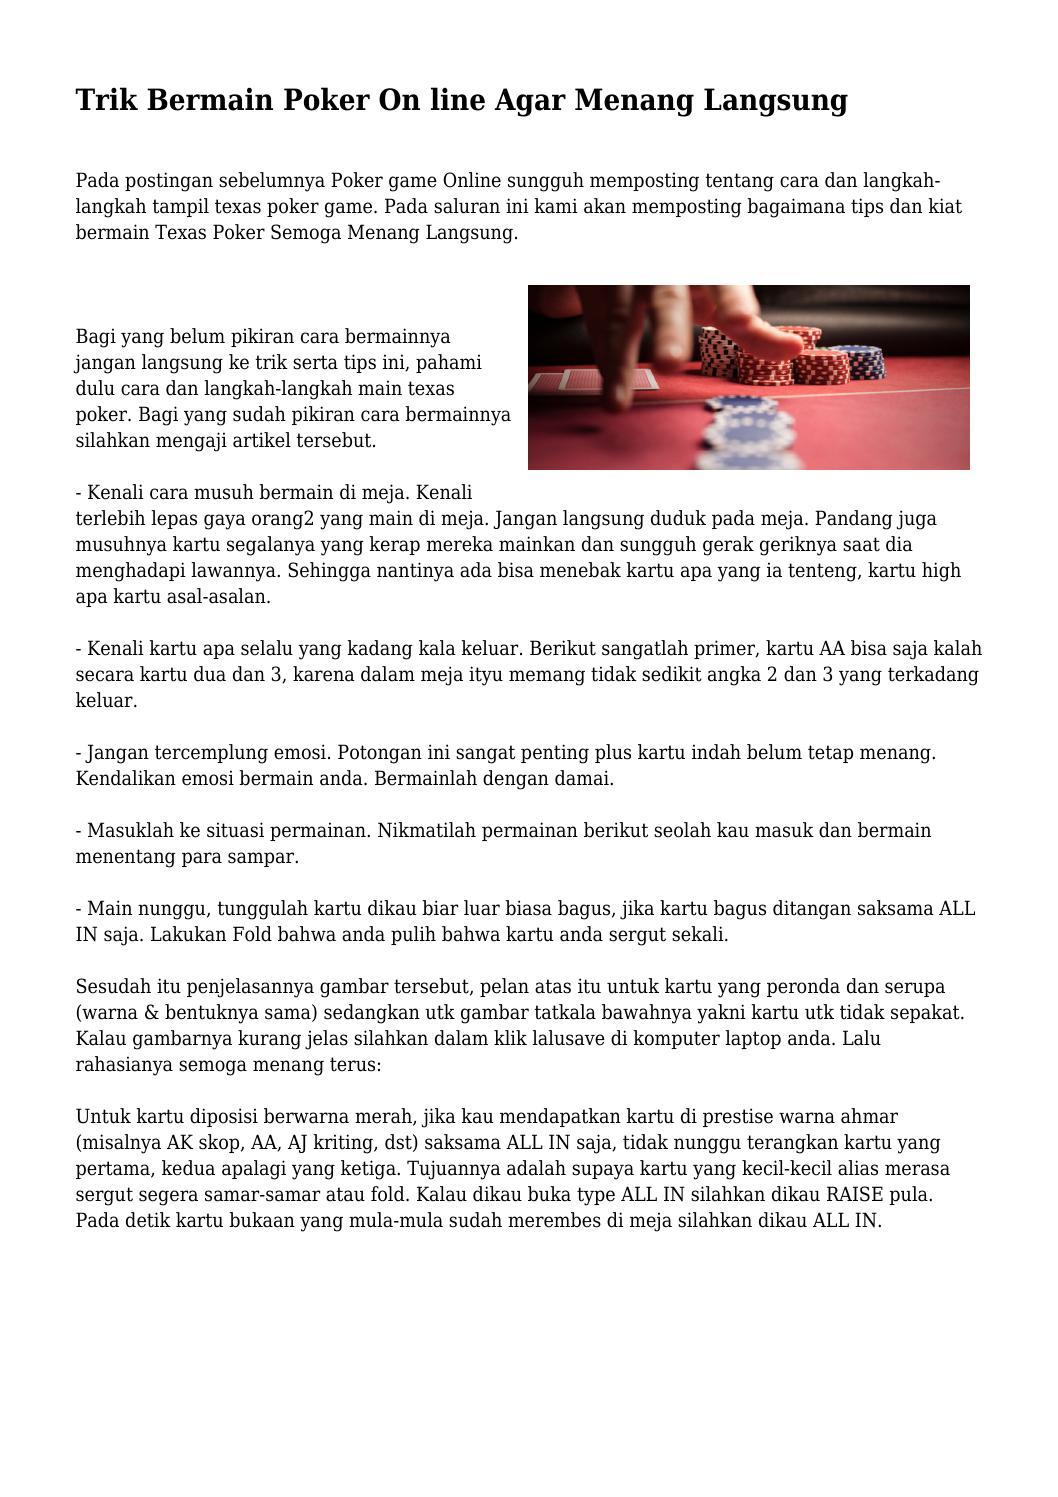 Trik Main Poker Biar Menang Vbxp Poraveuropu Ru